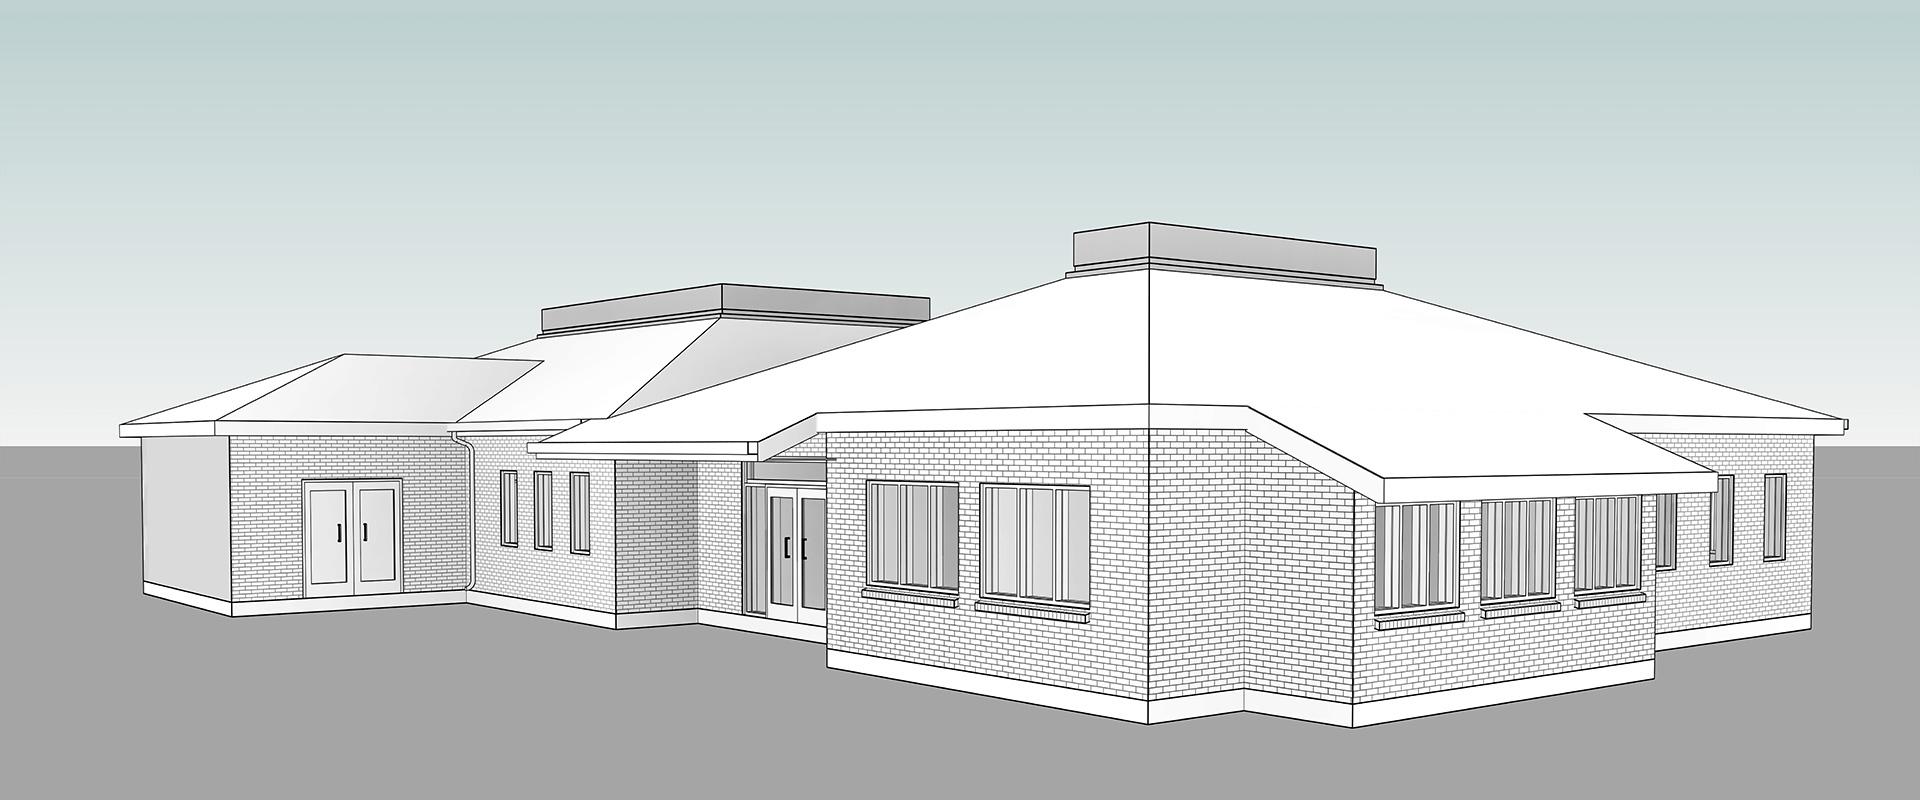 Architectural_Revit_Modeling_Birken-Inspection-Lab_BIM_Project_by-United-BIM